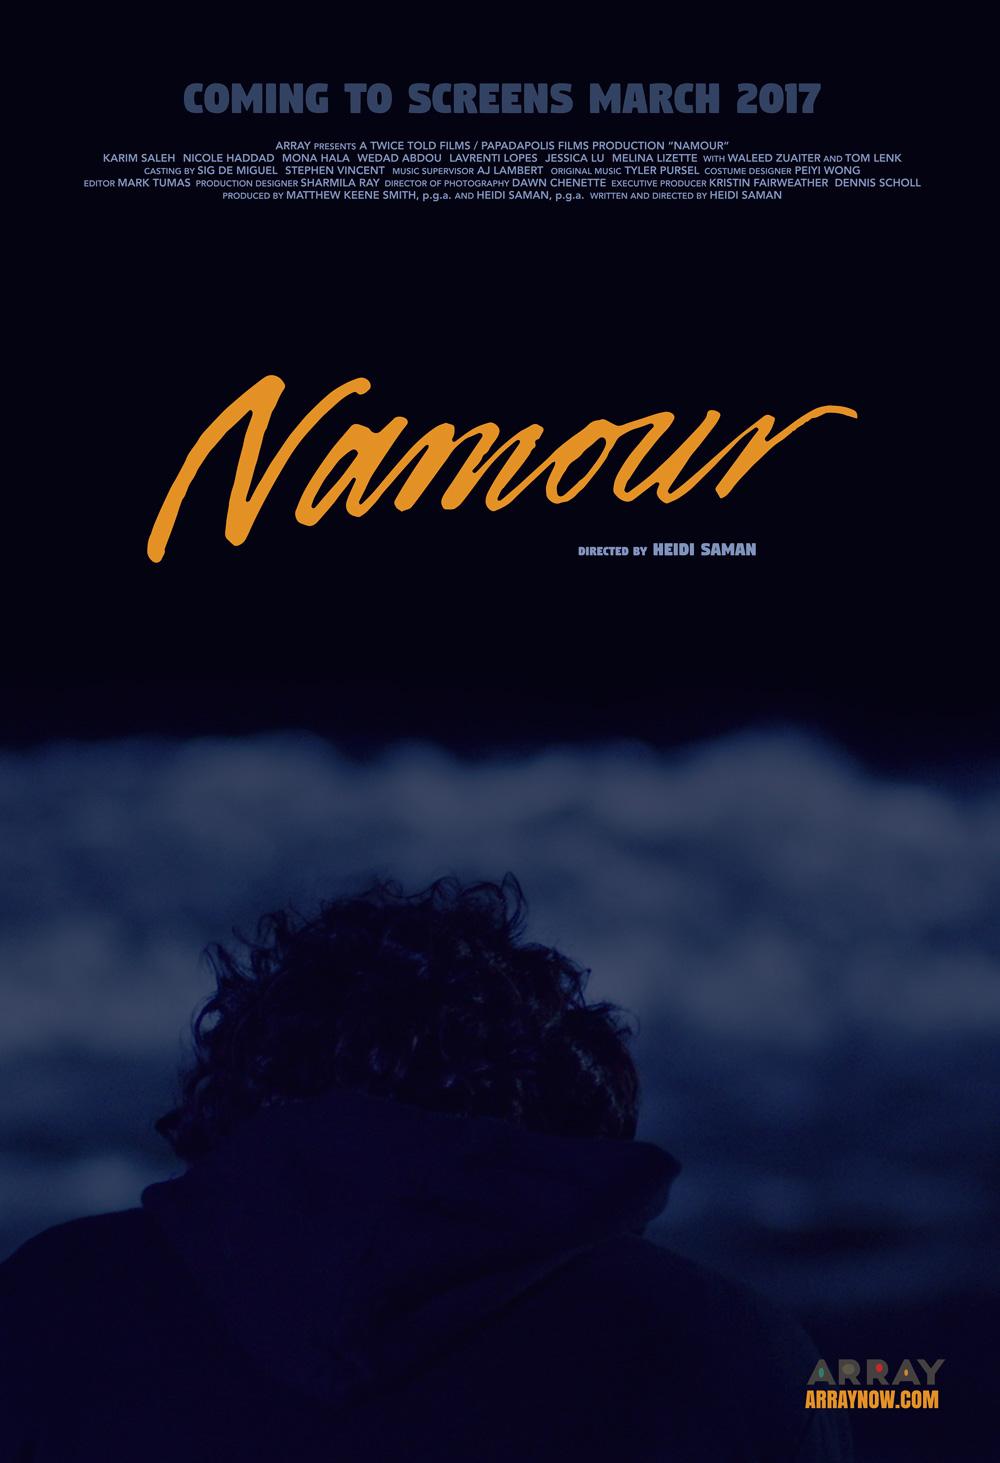 NAMOUR_ARRAYPoster_DigitalVersion.jpg